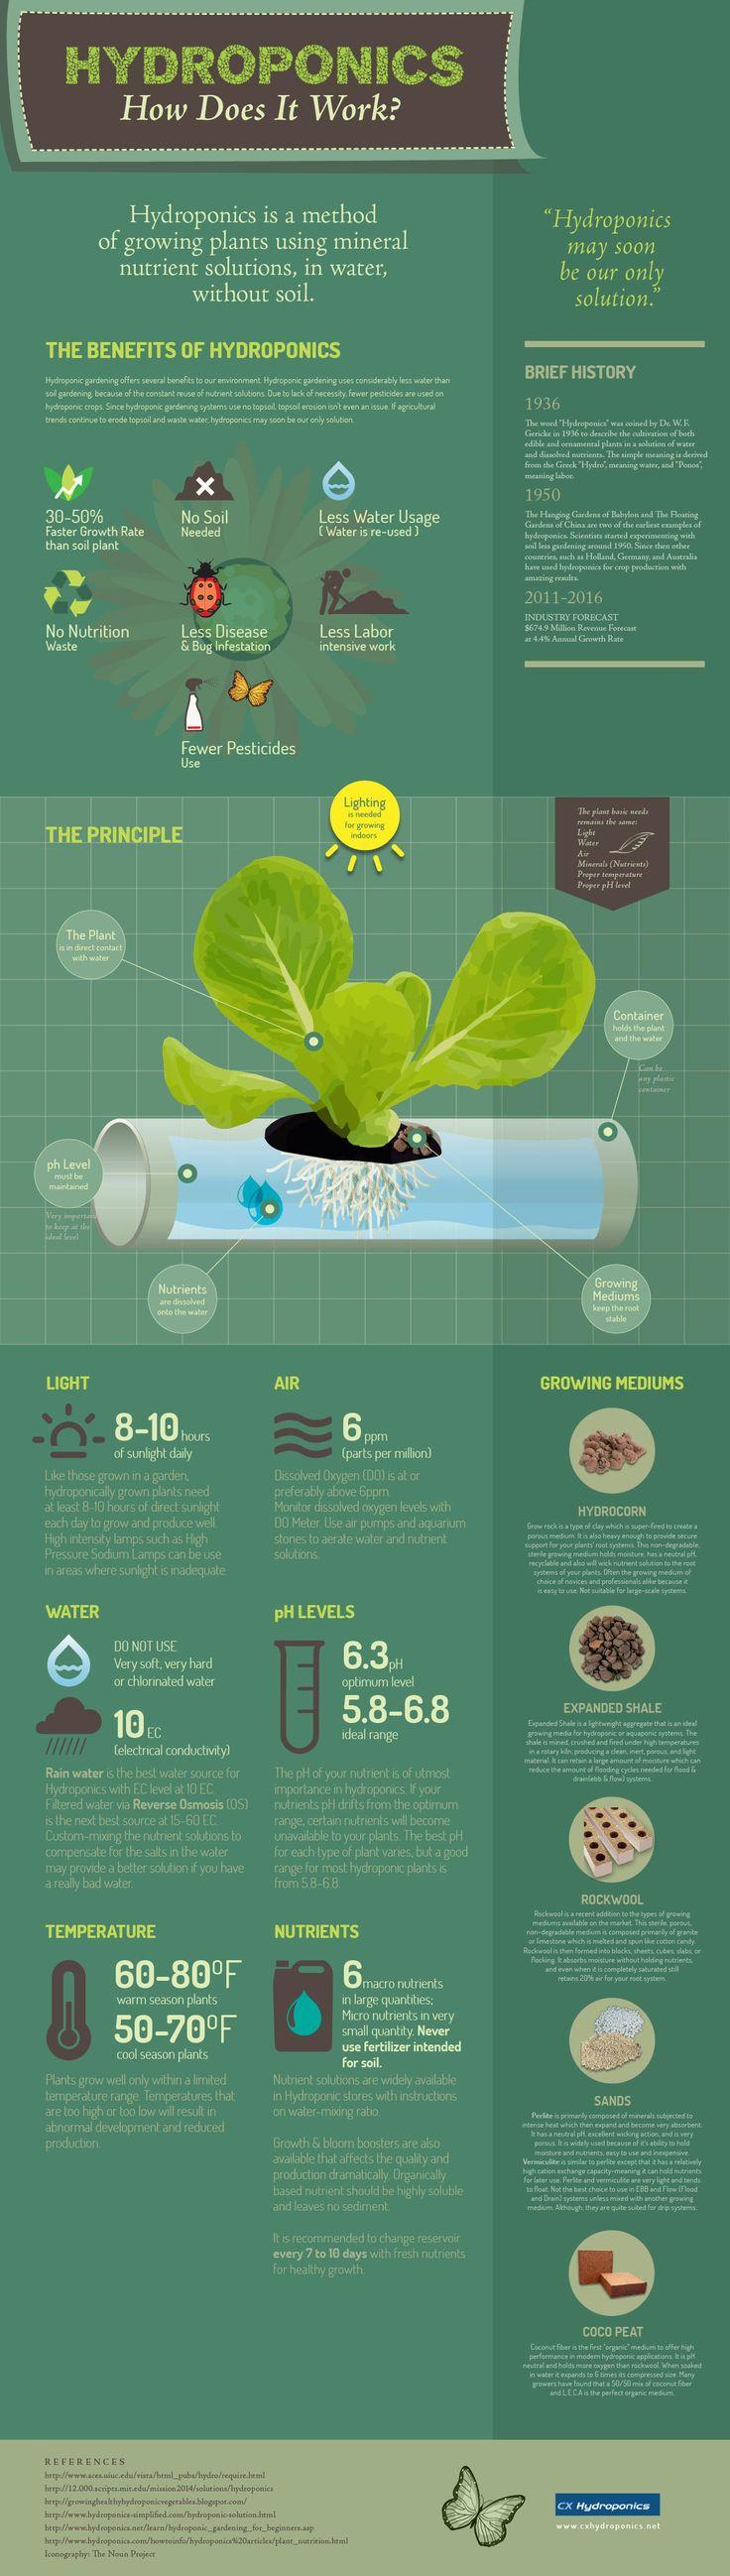 25 best ideas about vertical hydroponics on pinterest for Idea untuk garden